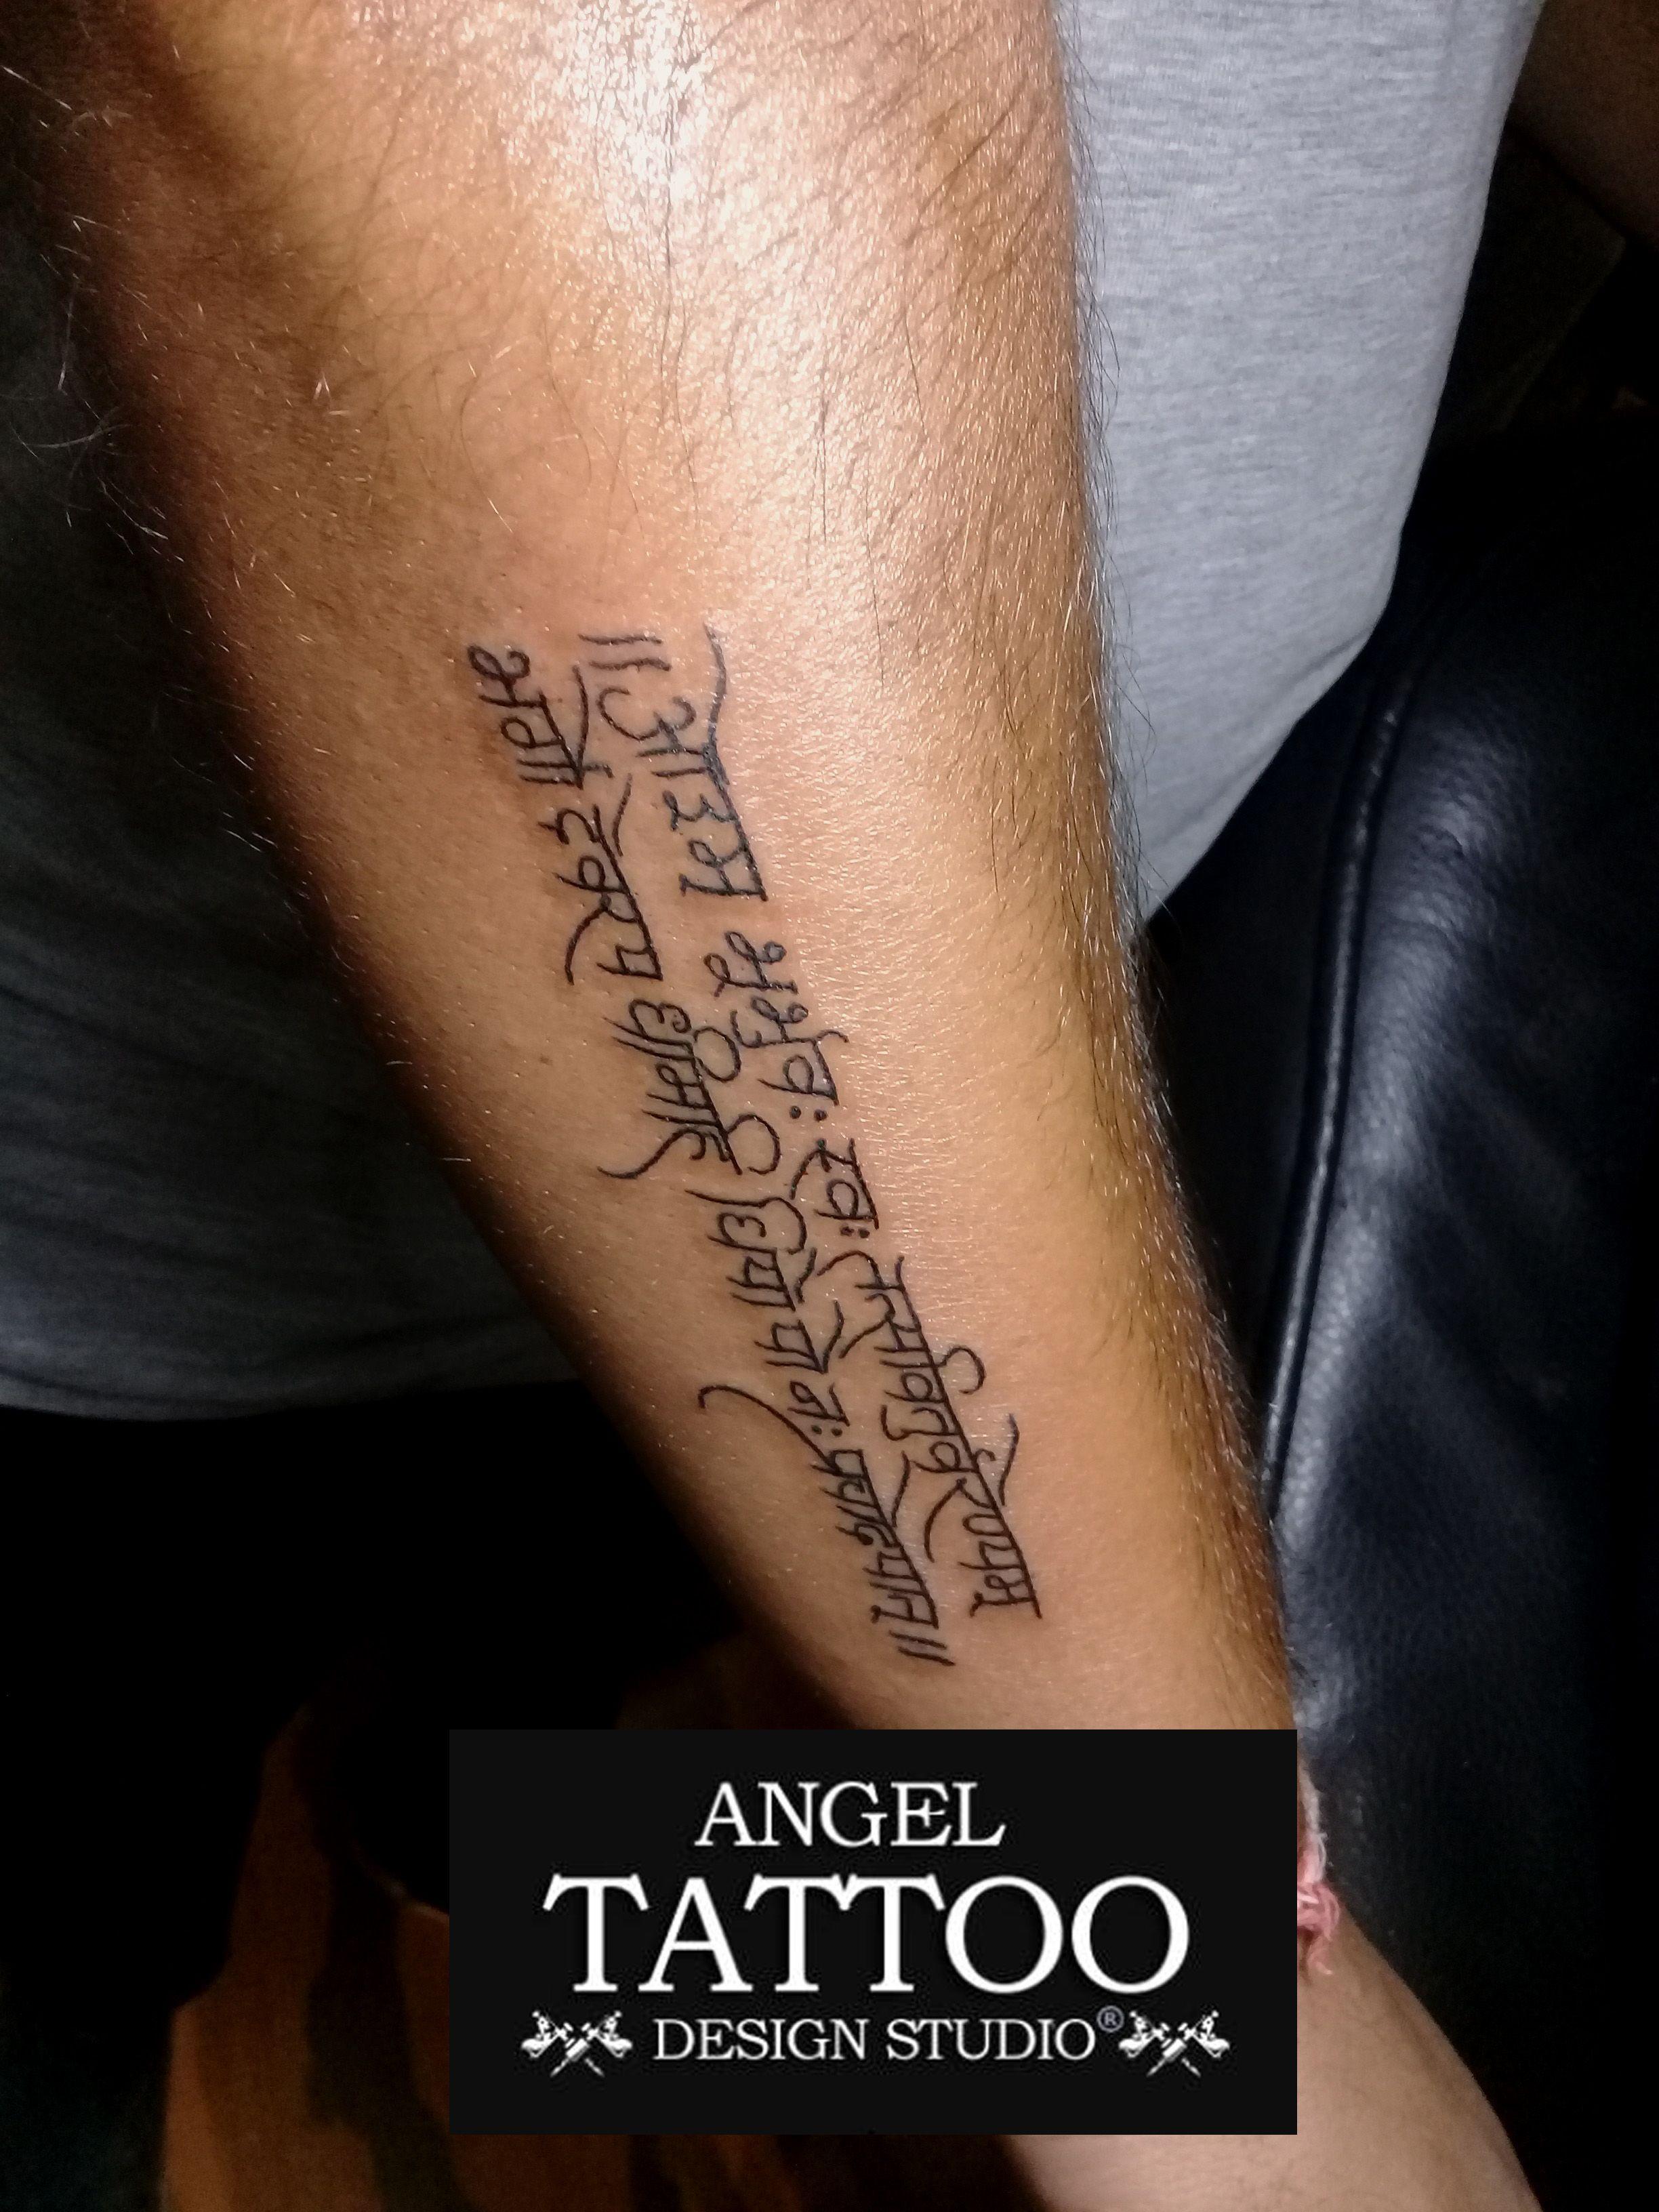 Gayatri mantra tattoo made on forearm at angel tattoo